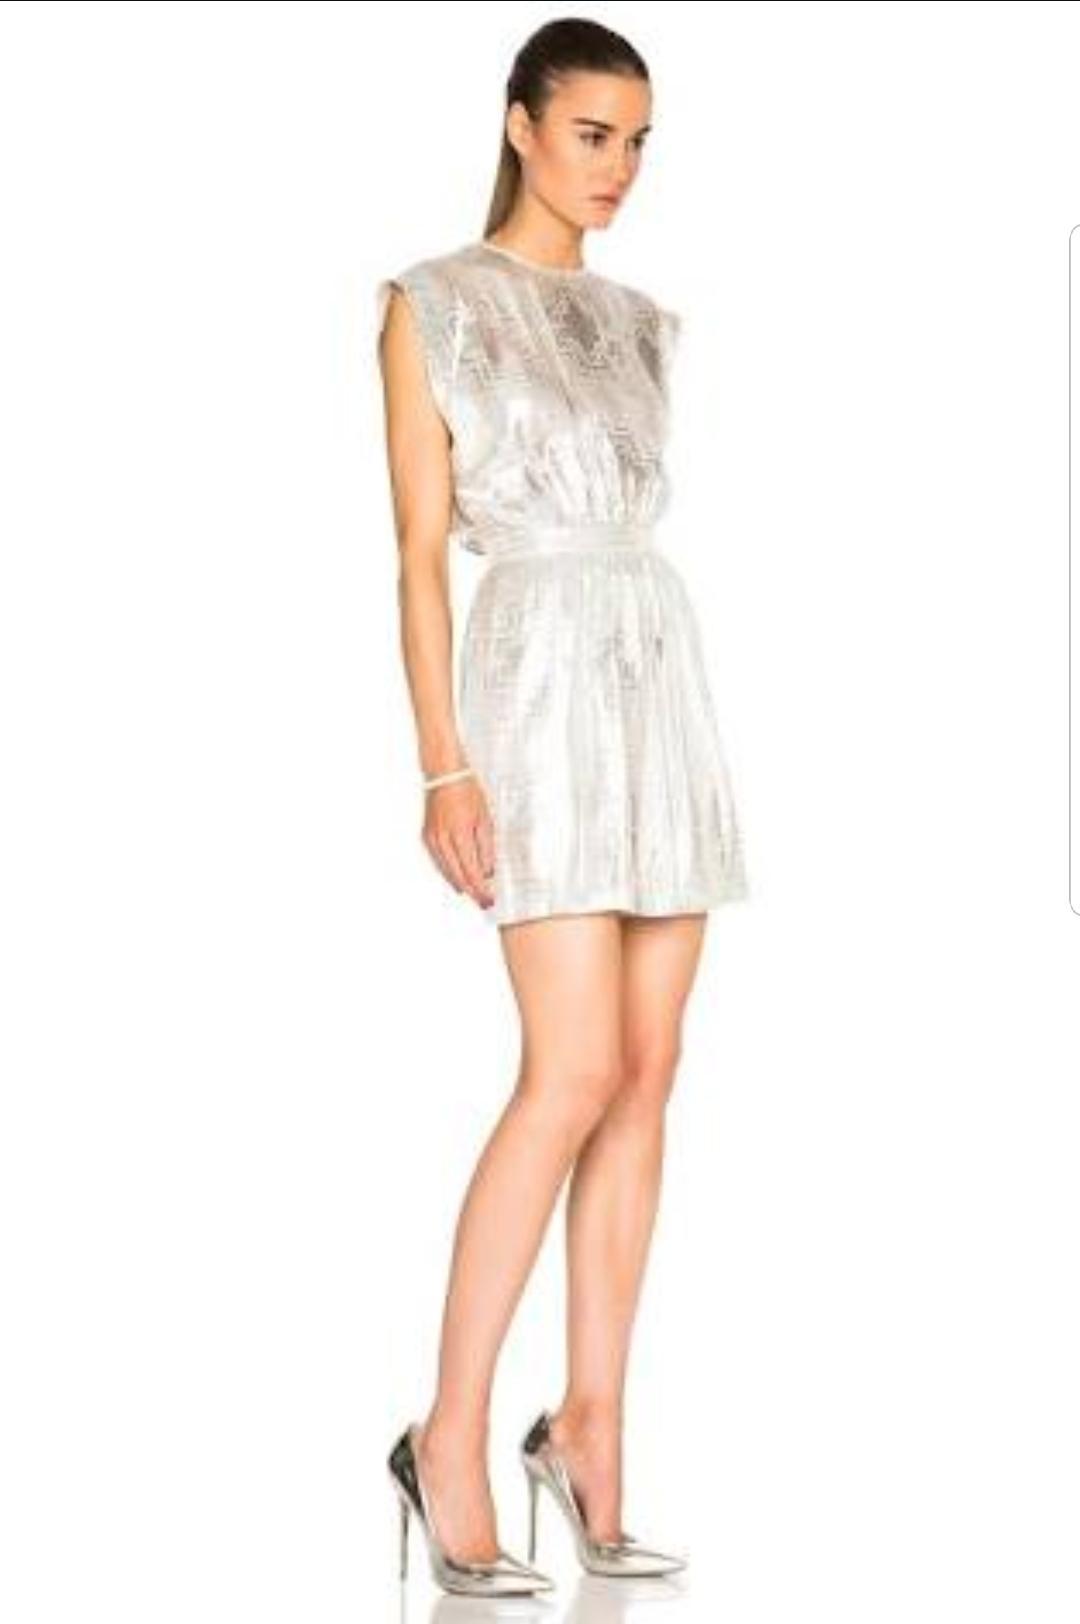 Sass Bide Sega Sega Dress In Metallic Silver Size 8 The Volte